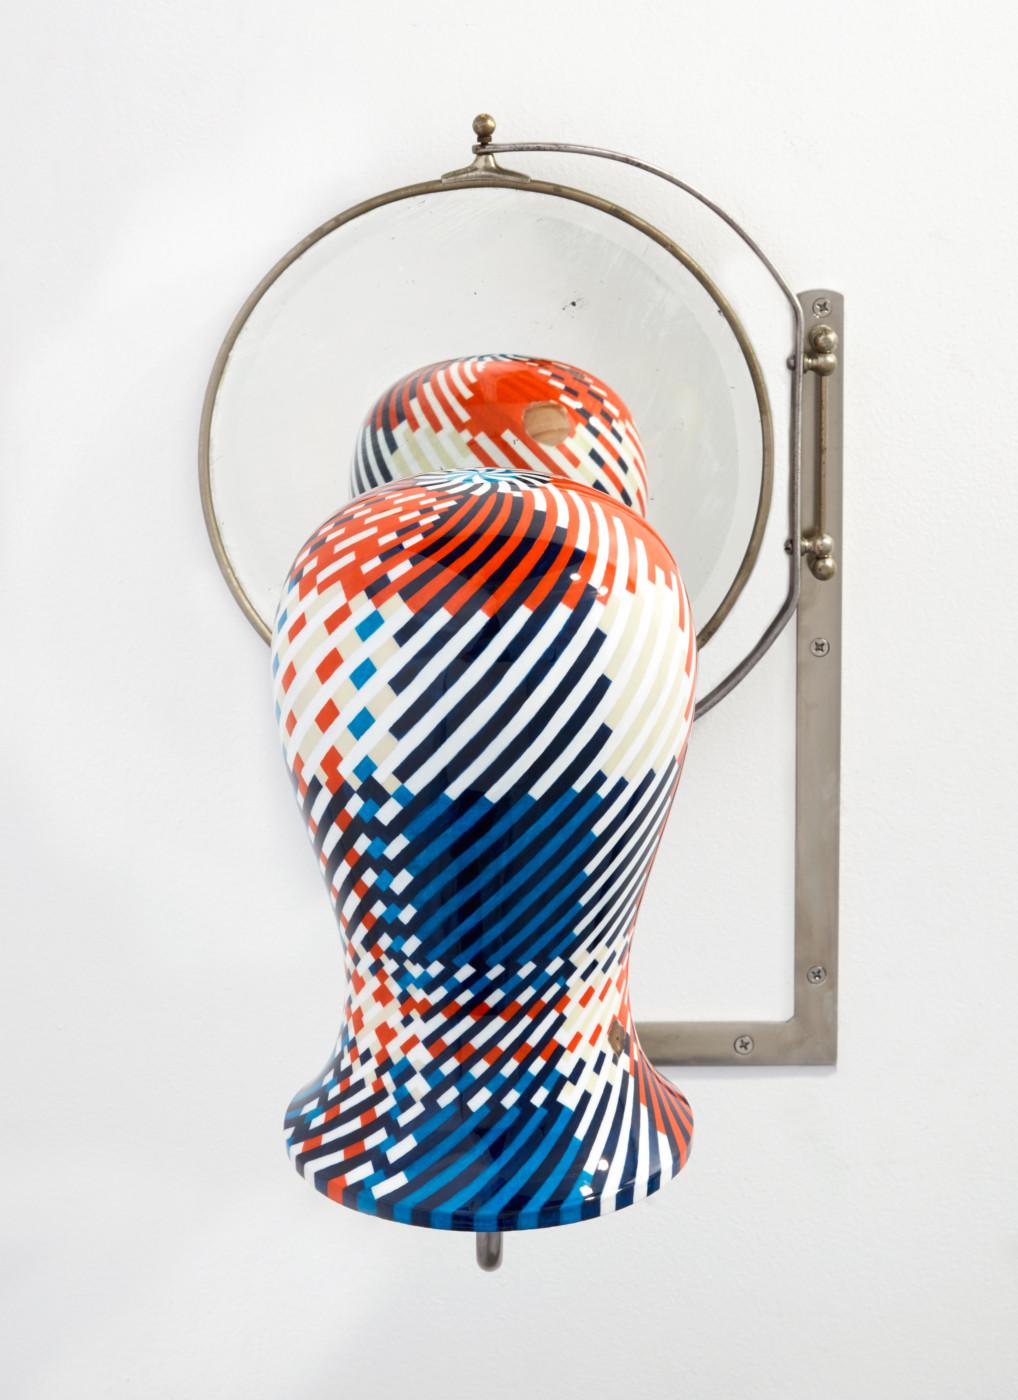 TÊTE  Tête fig. 5</I> (detail), 2019 Acrylic, enamel, wood, steel, mirror 53 x 37 x 38.5 cm / 20 7/8 x 14 5/8 x 15 1/8 in  ORION MARTIN